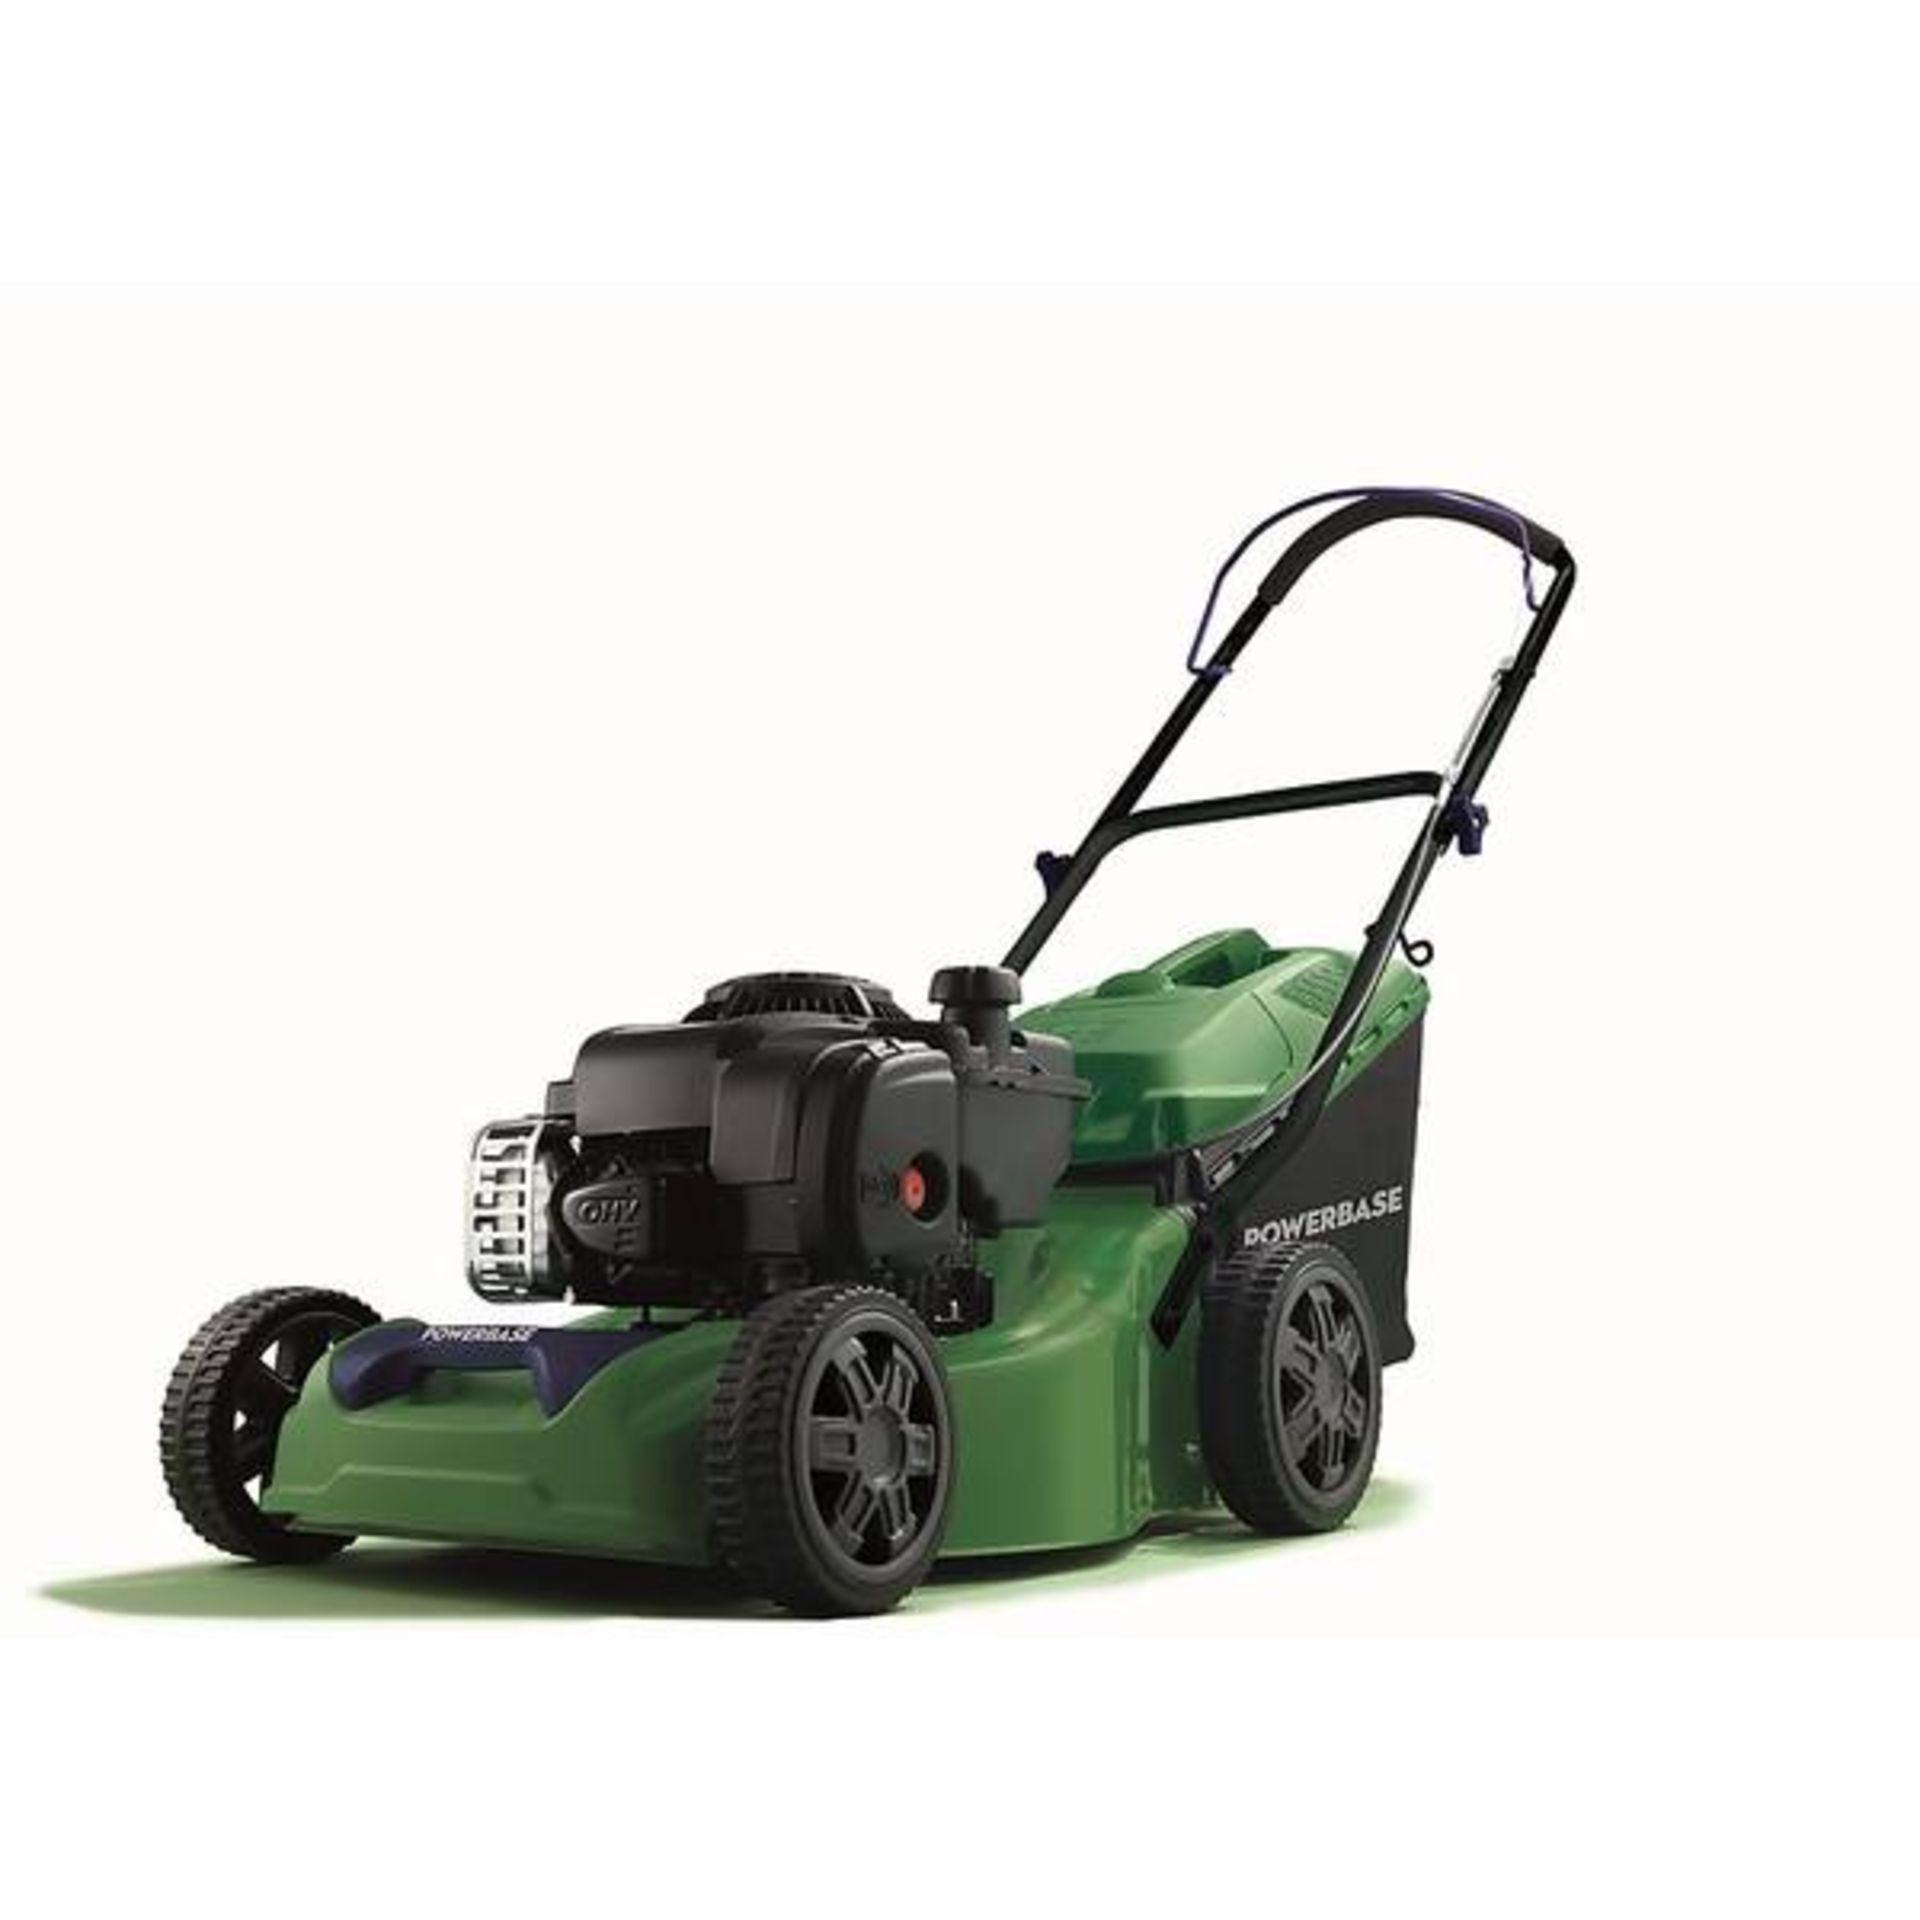 (P10) 1x Powerbase 41cm 125cc Push Petrol Rotary Lawn Mower (XSS41D) RRP £199. New, Clean Unused I